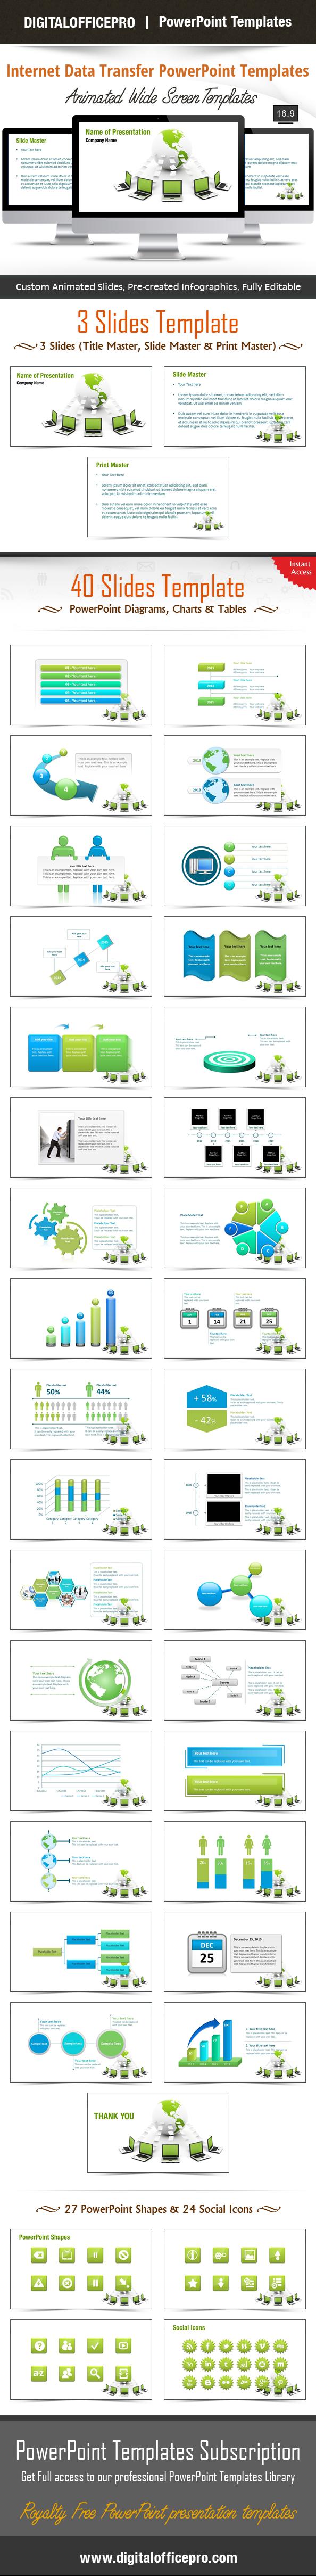 Internet Data Transfer Powerpoint Template Backgrounds Powerpoint Templates Templates Powerpoint